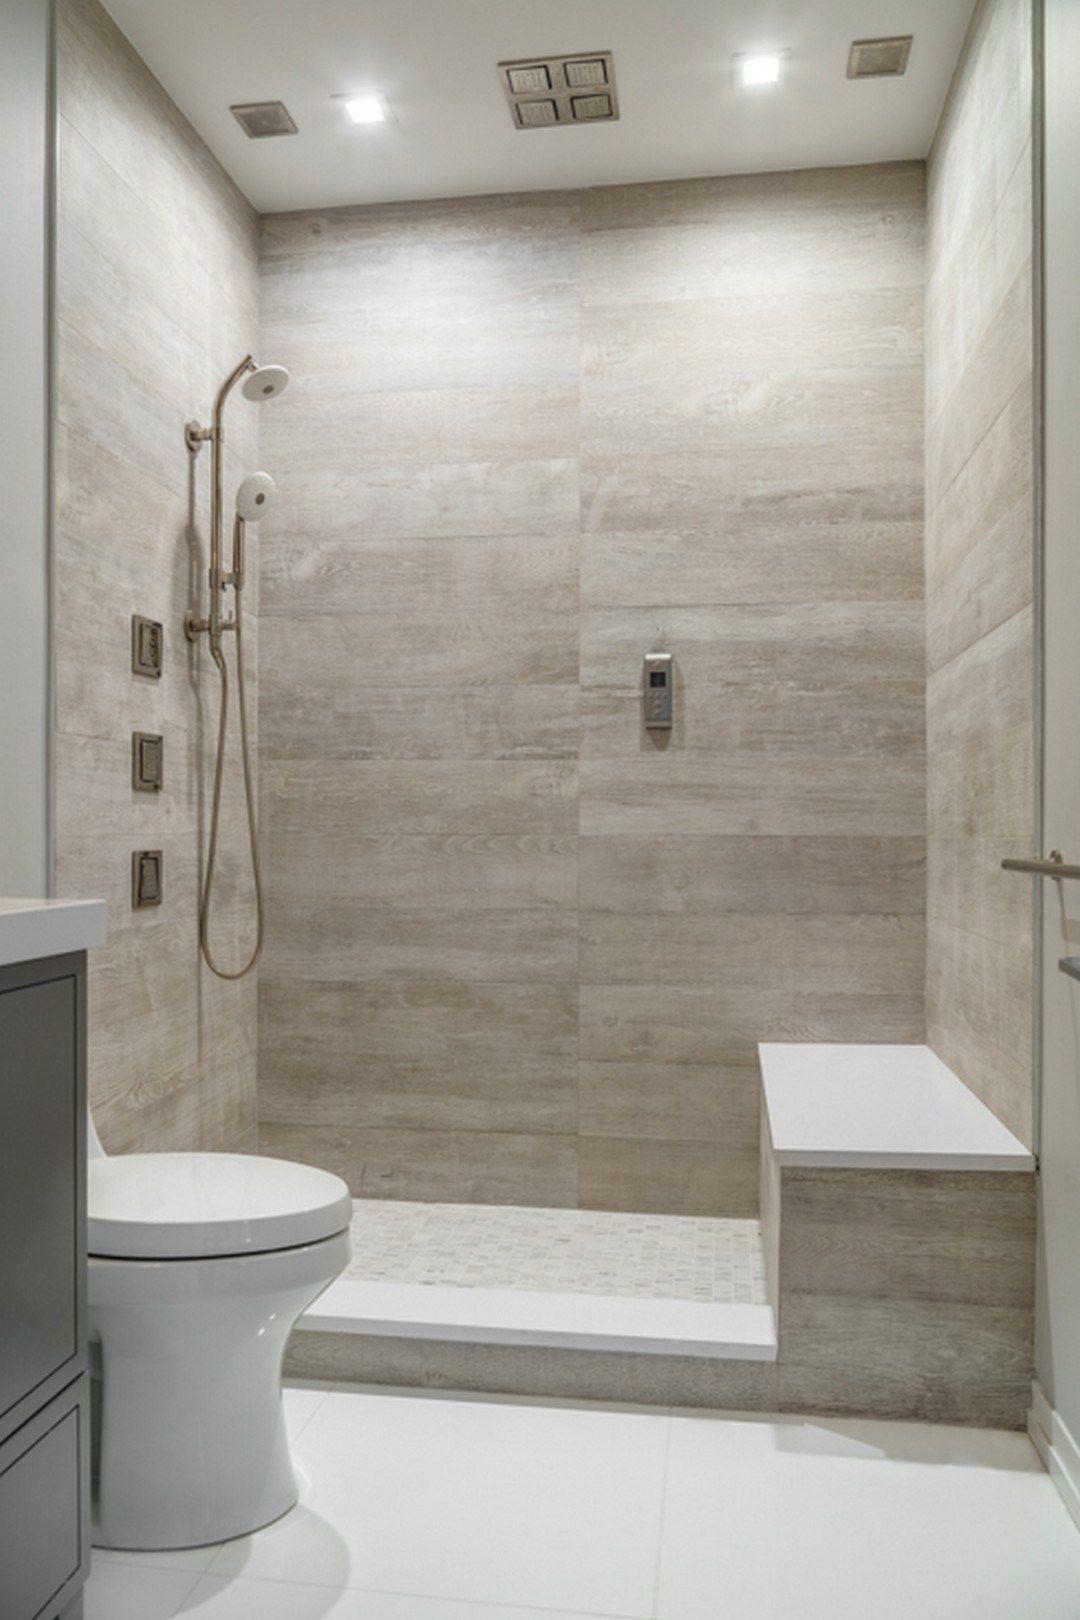 Best Kitchen Gallery: 99 New Trends Bathroom Tile Design Inspiration 2017 31 Master of Design For Bathroom  on rachelxblog.com